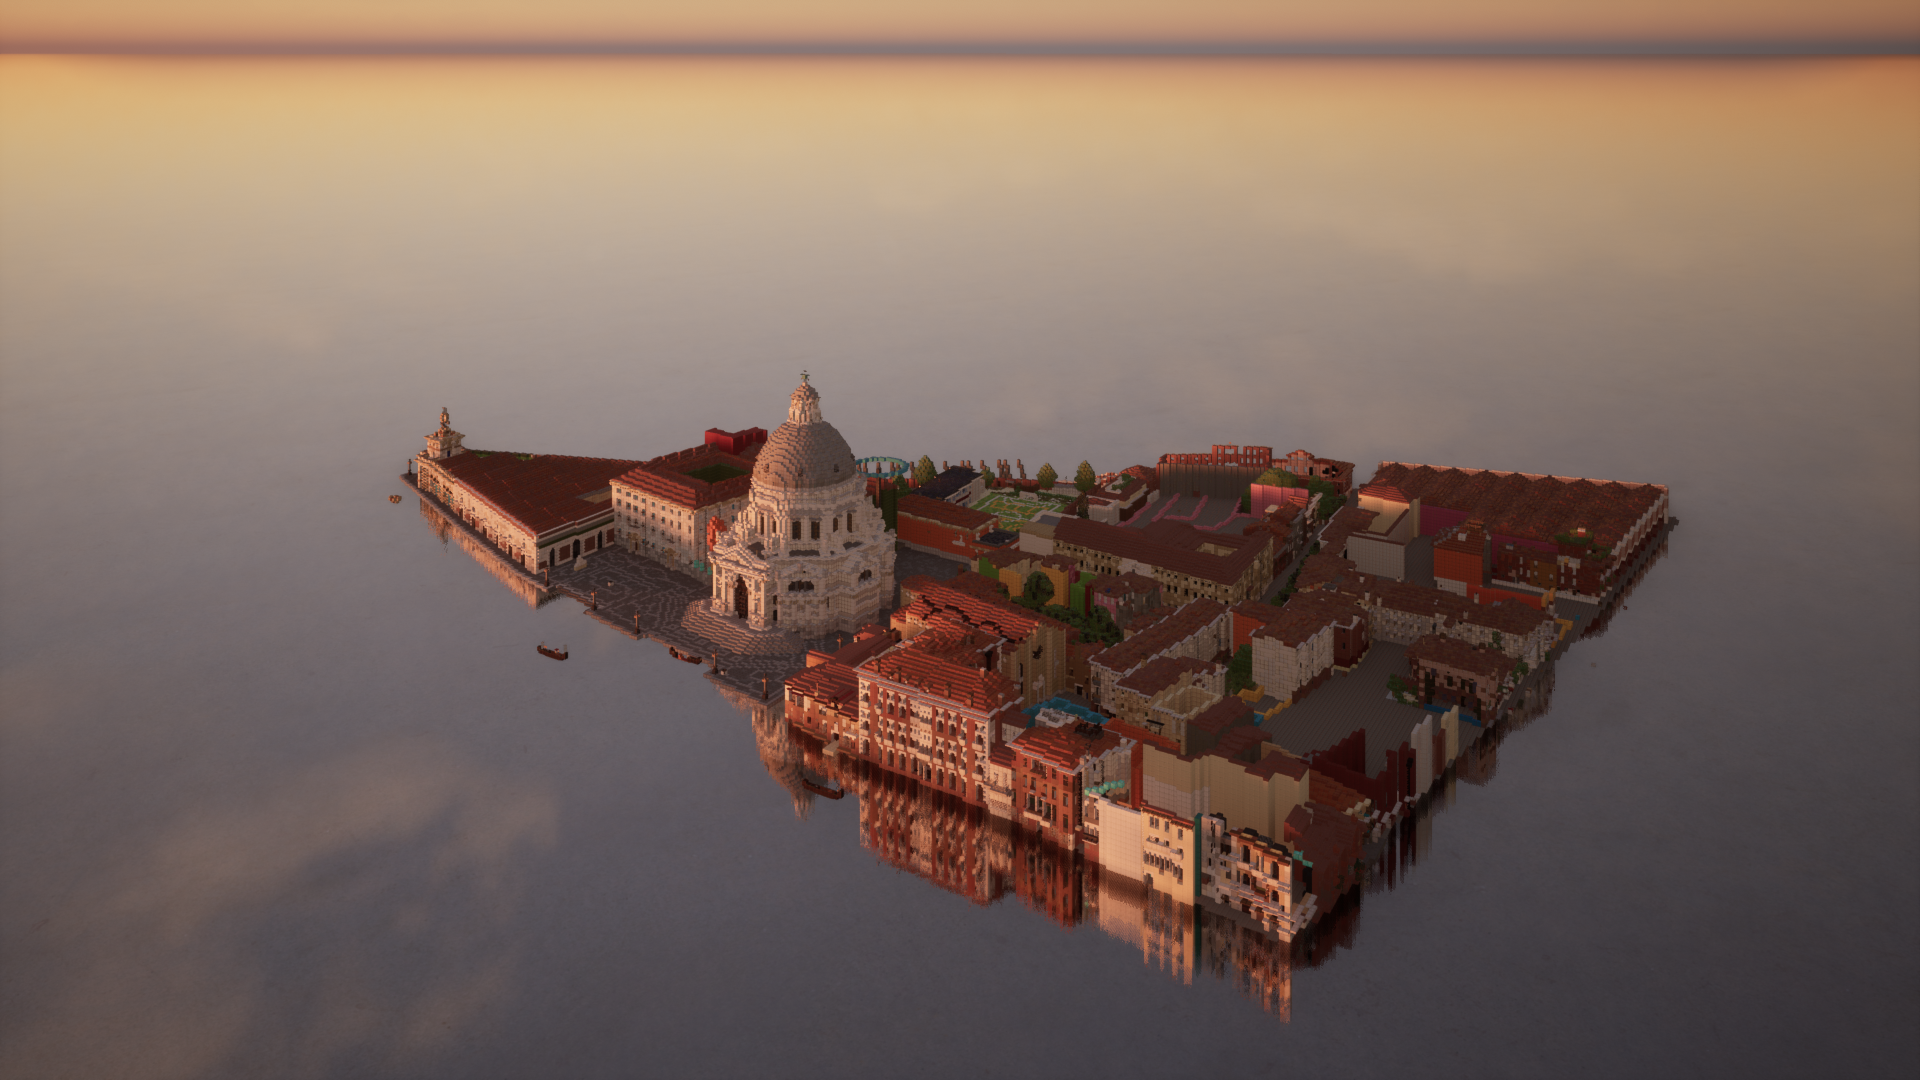 Italy Venice Basilica 1920x1080